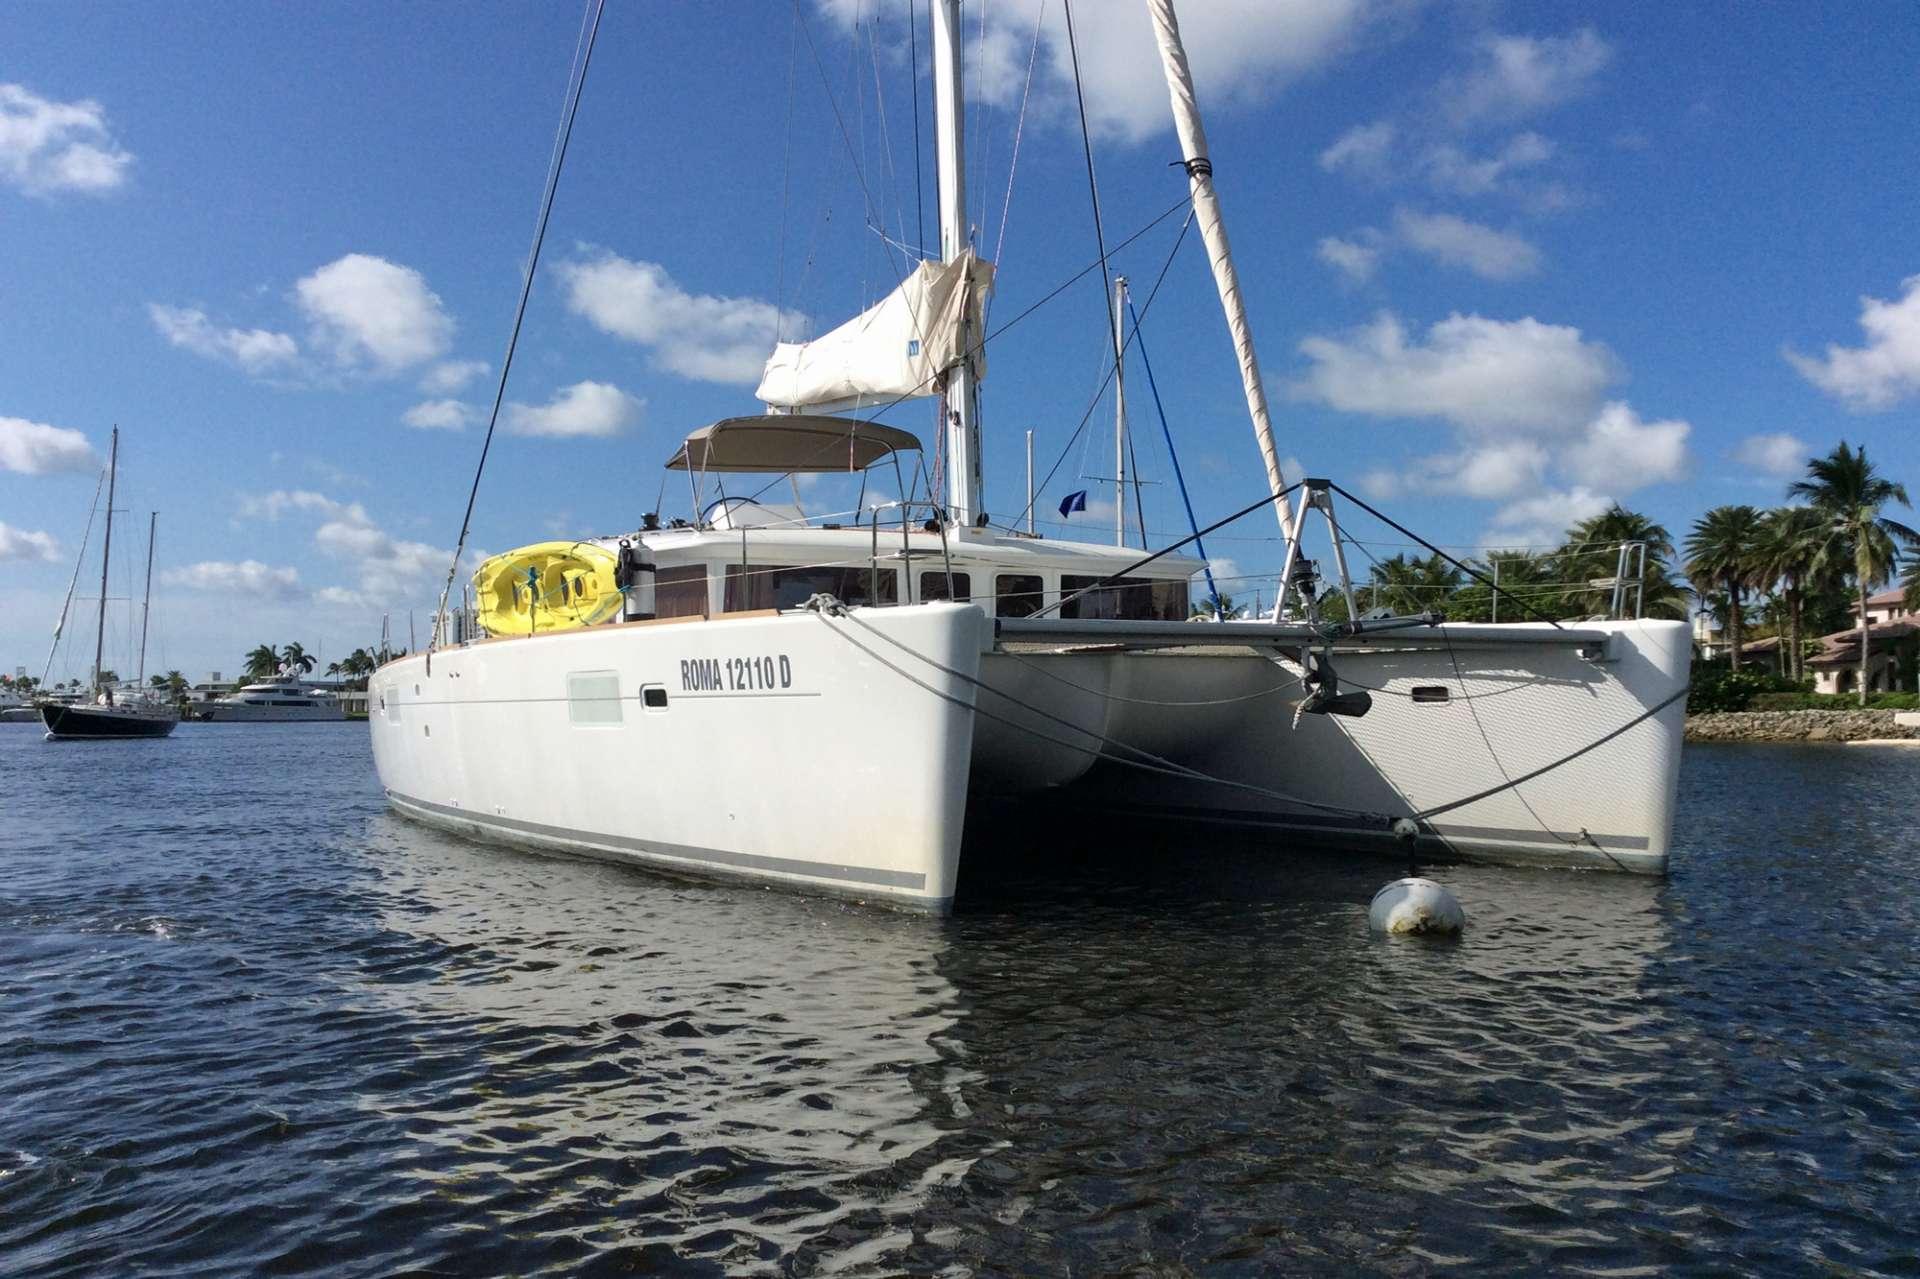 Delicia at anchor